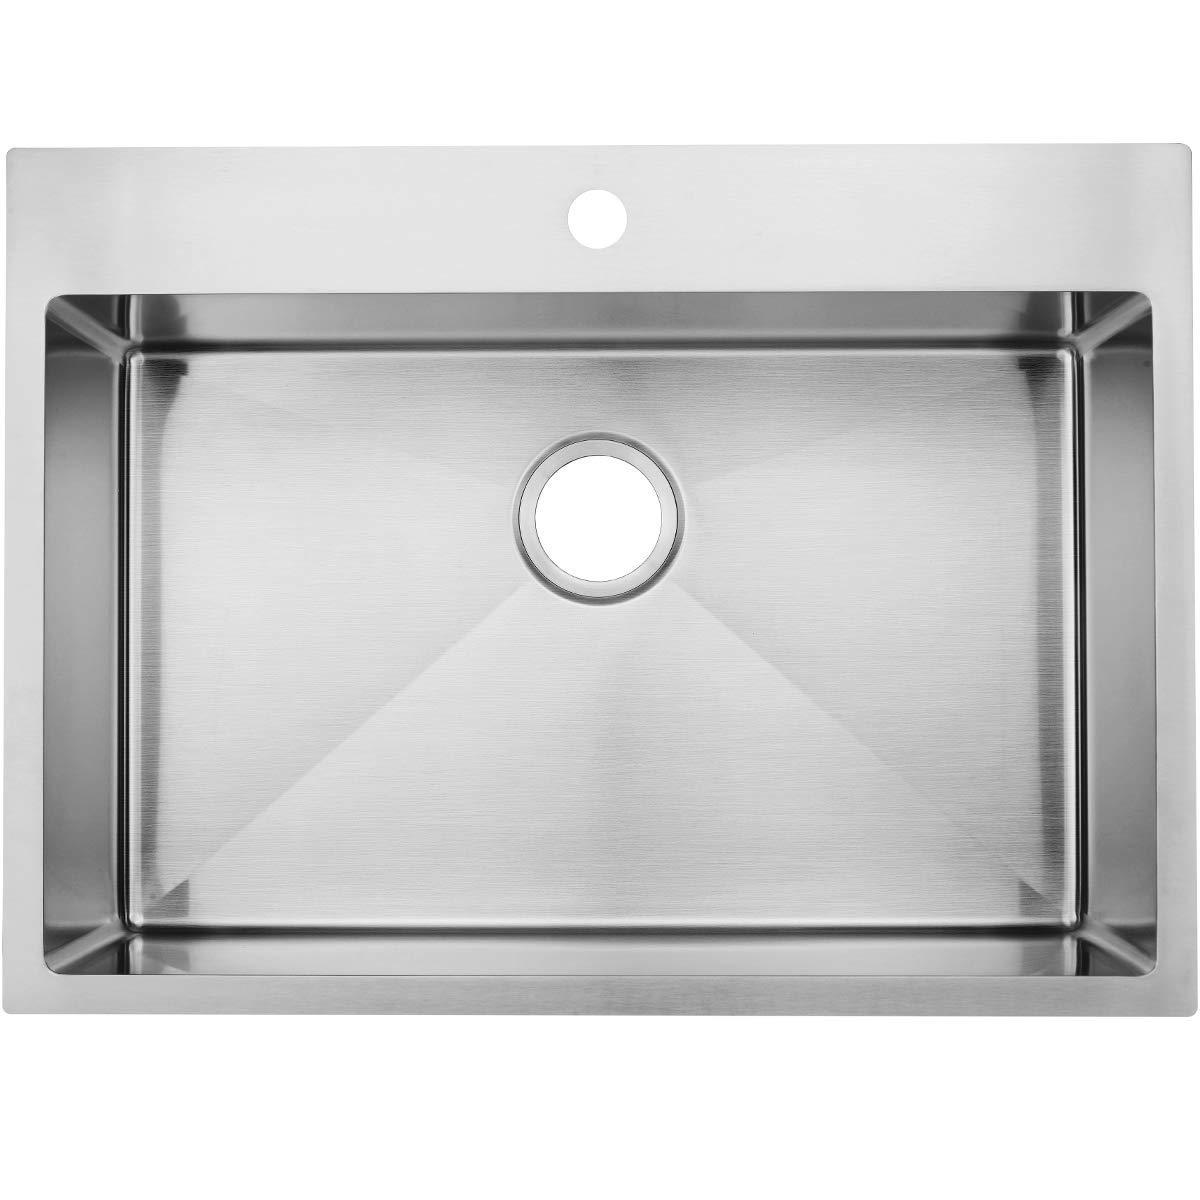 Commercial 28 Inch 16 Gauge Top mount Drop-in Single Bowl Basin Handmade T304 Stainless Steel Kitchen Sink, 10 Inch Deep Brushed Nickel Kitchen Sinks